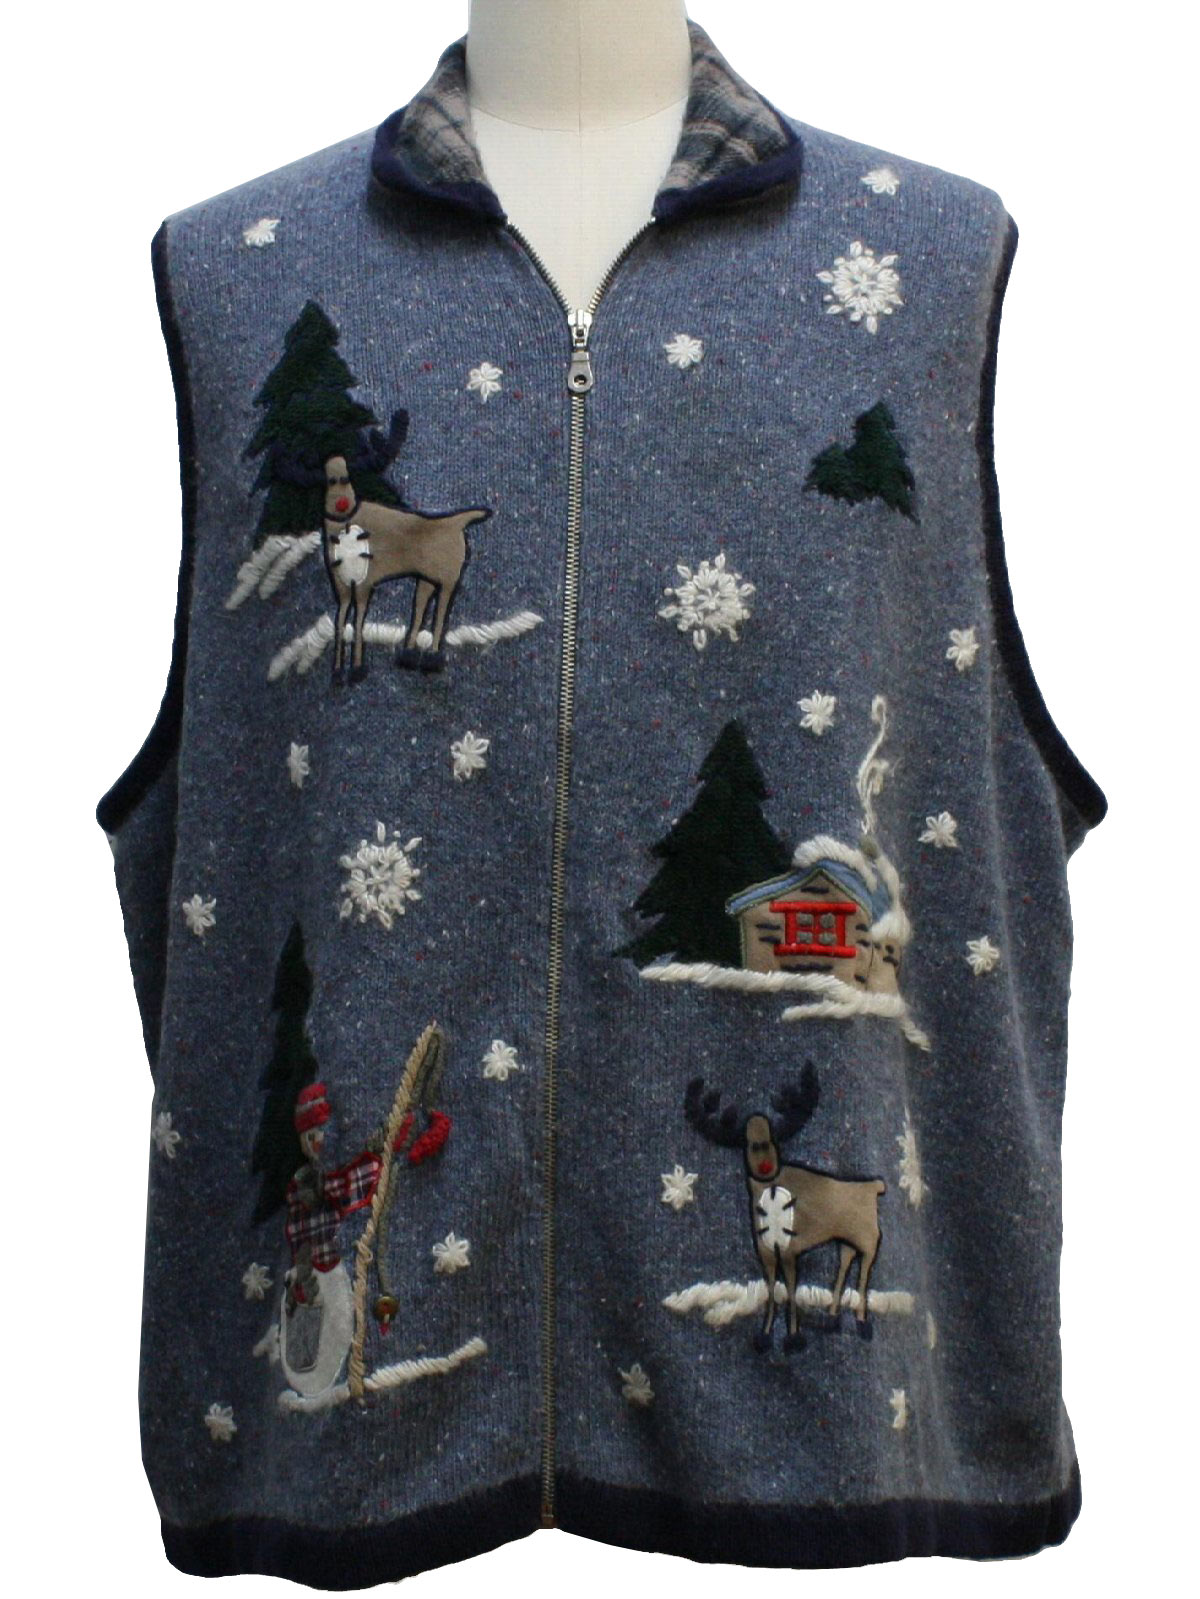 Ugly christmas sweater vest victoria jones unisex blue for Fishing ugly christmas sweater